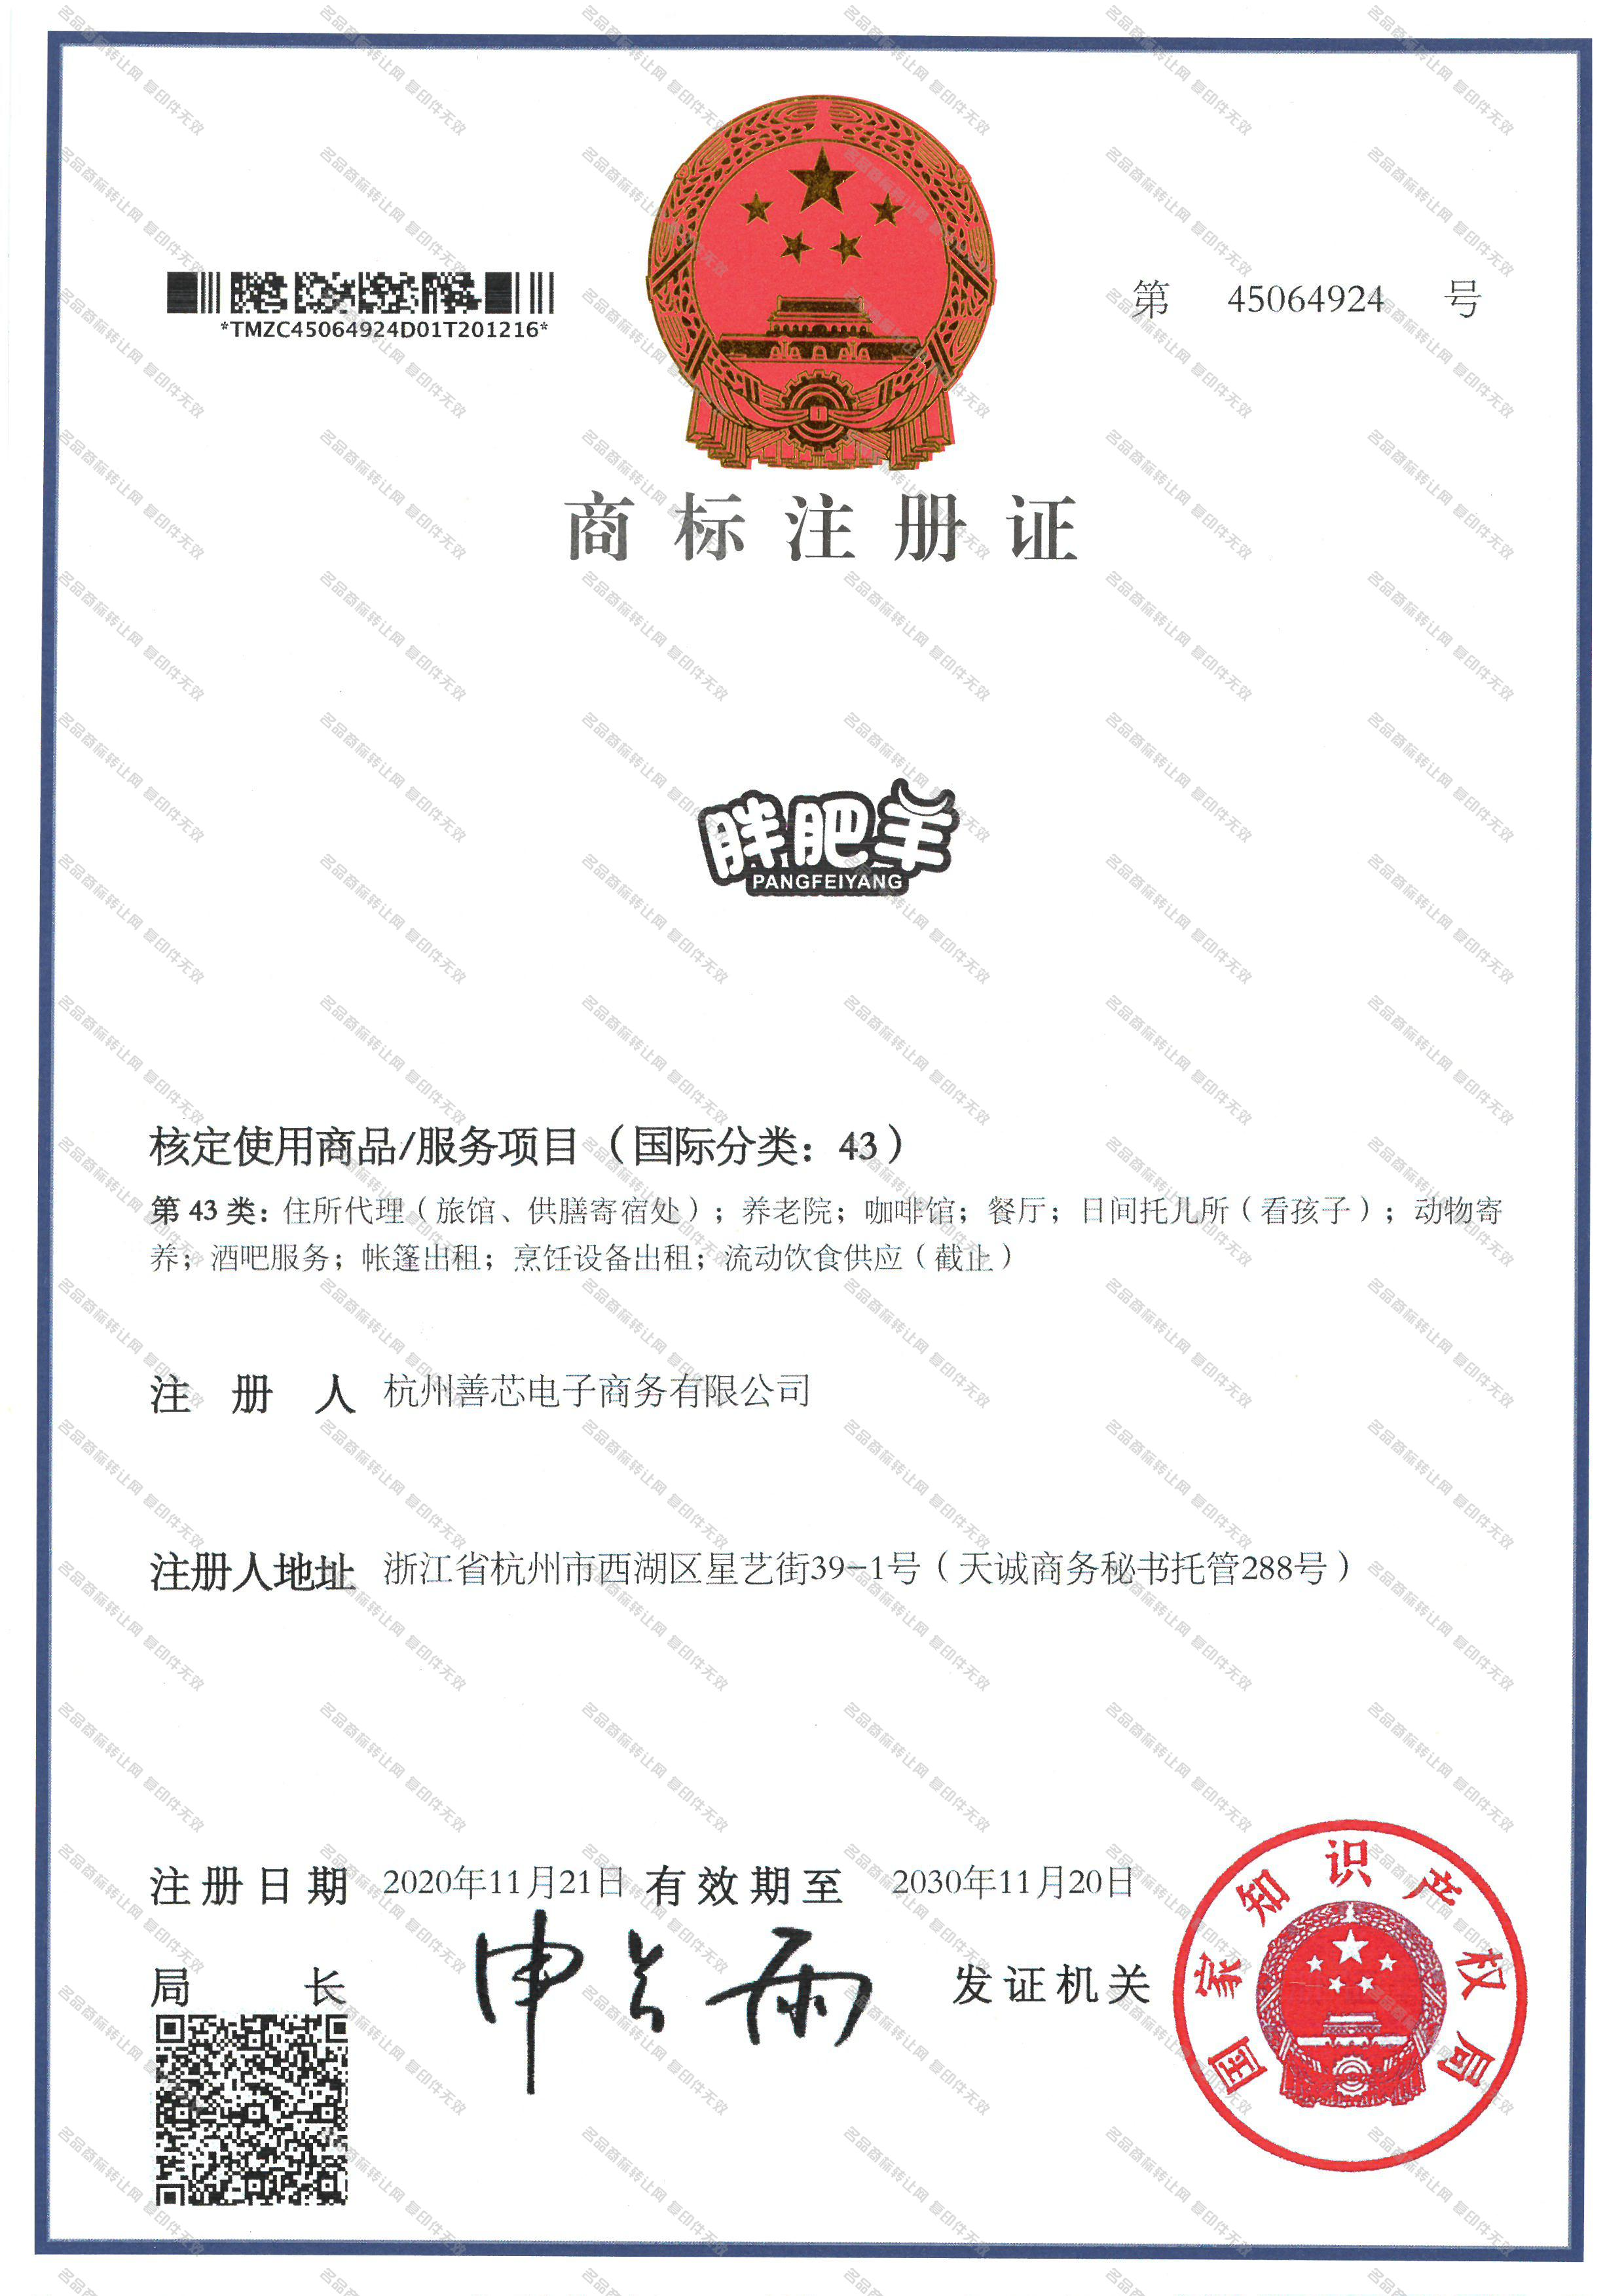 胖肥羊;PANGFEIYANG注册证